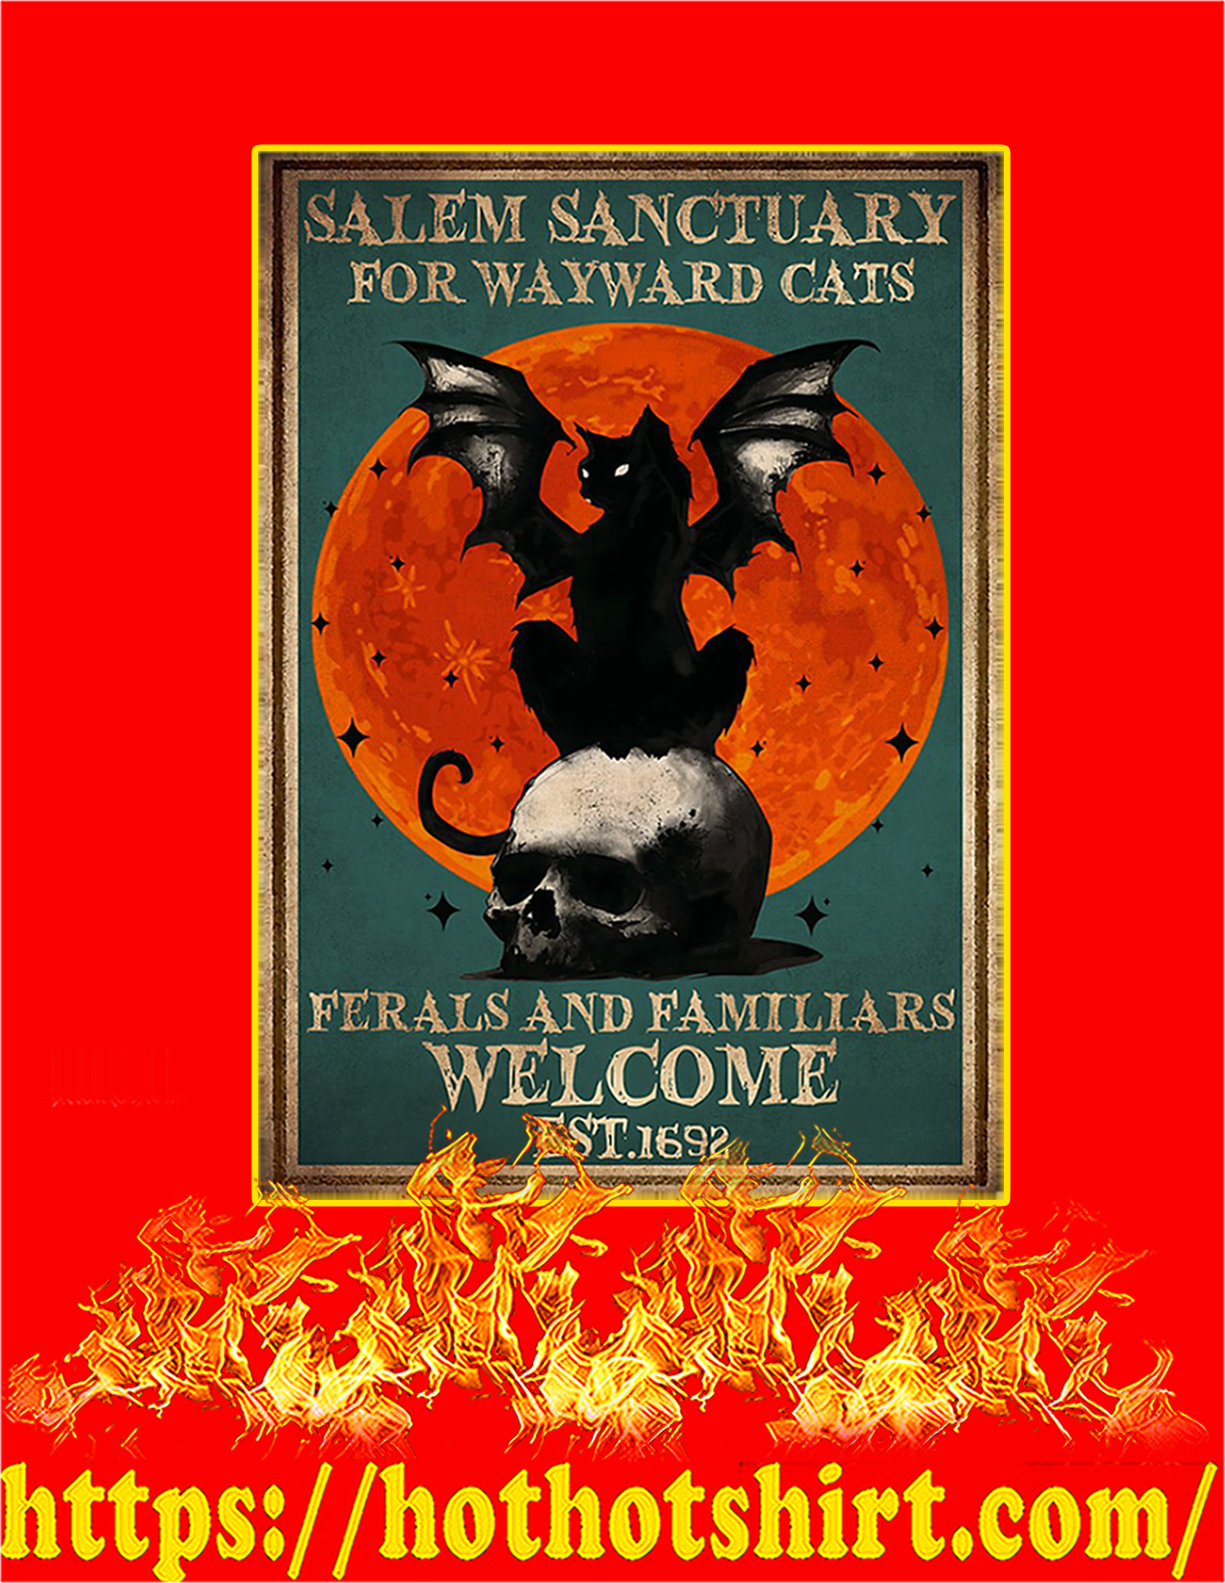 Salem sanctuary for wayward cats poster - A4